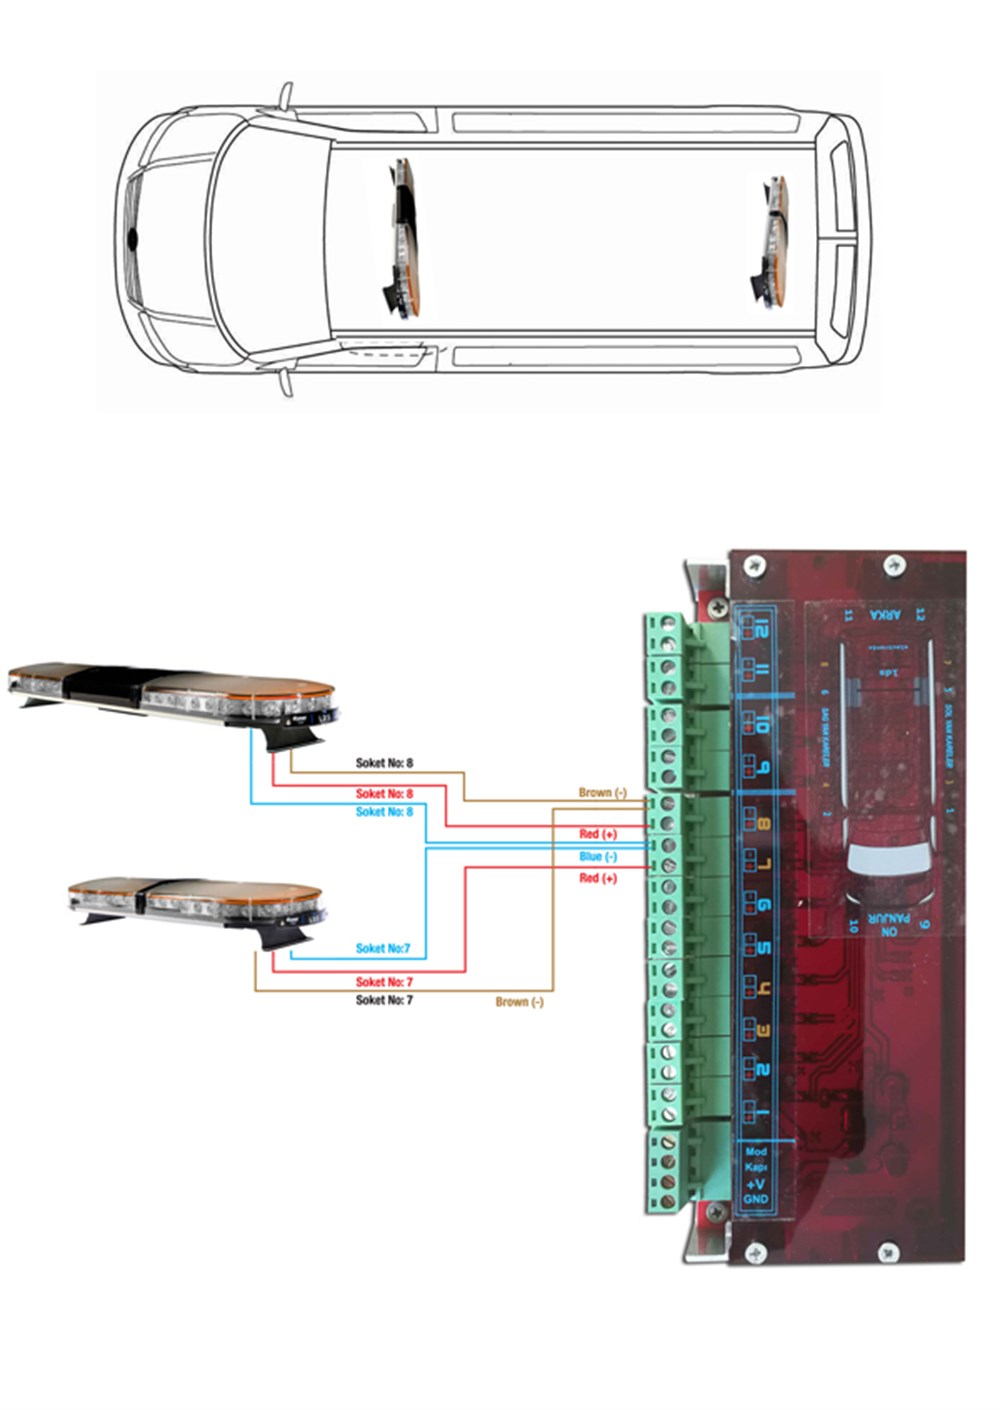 Mounting Diagram Space E-116